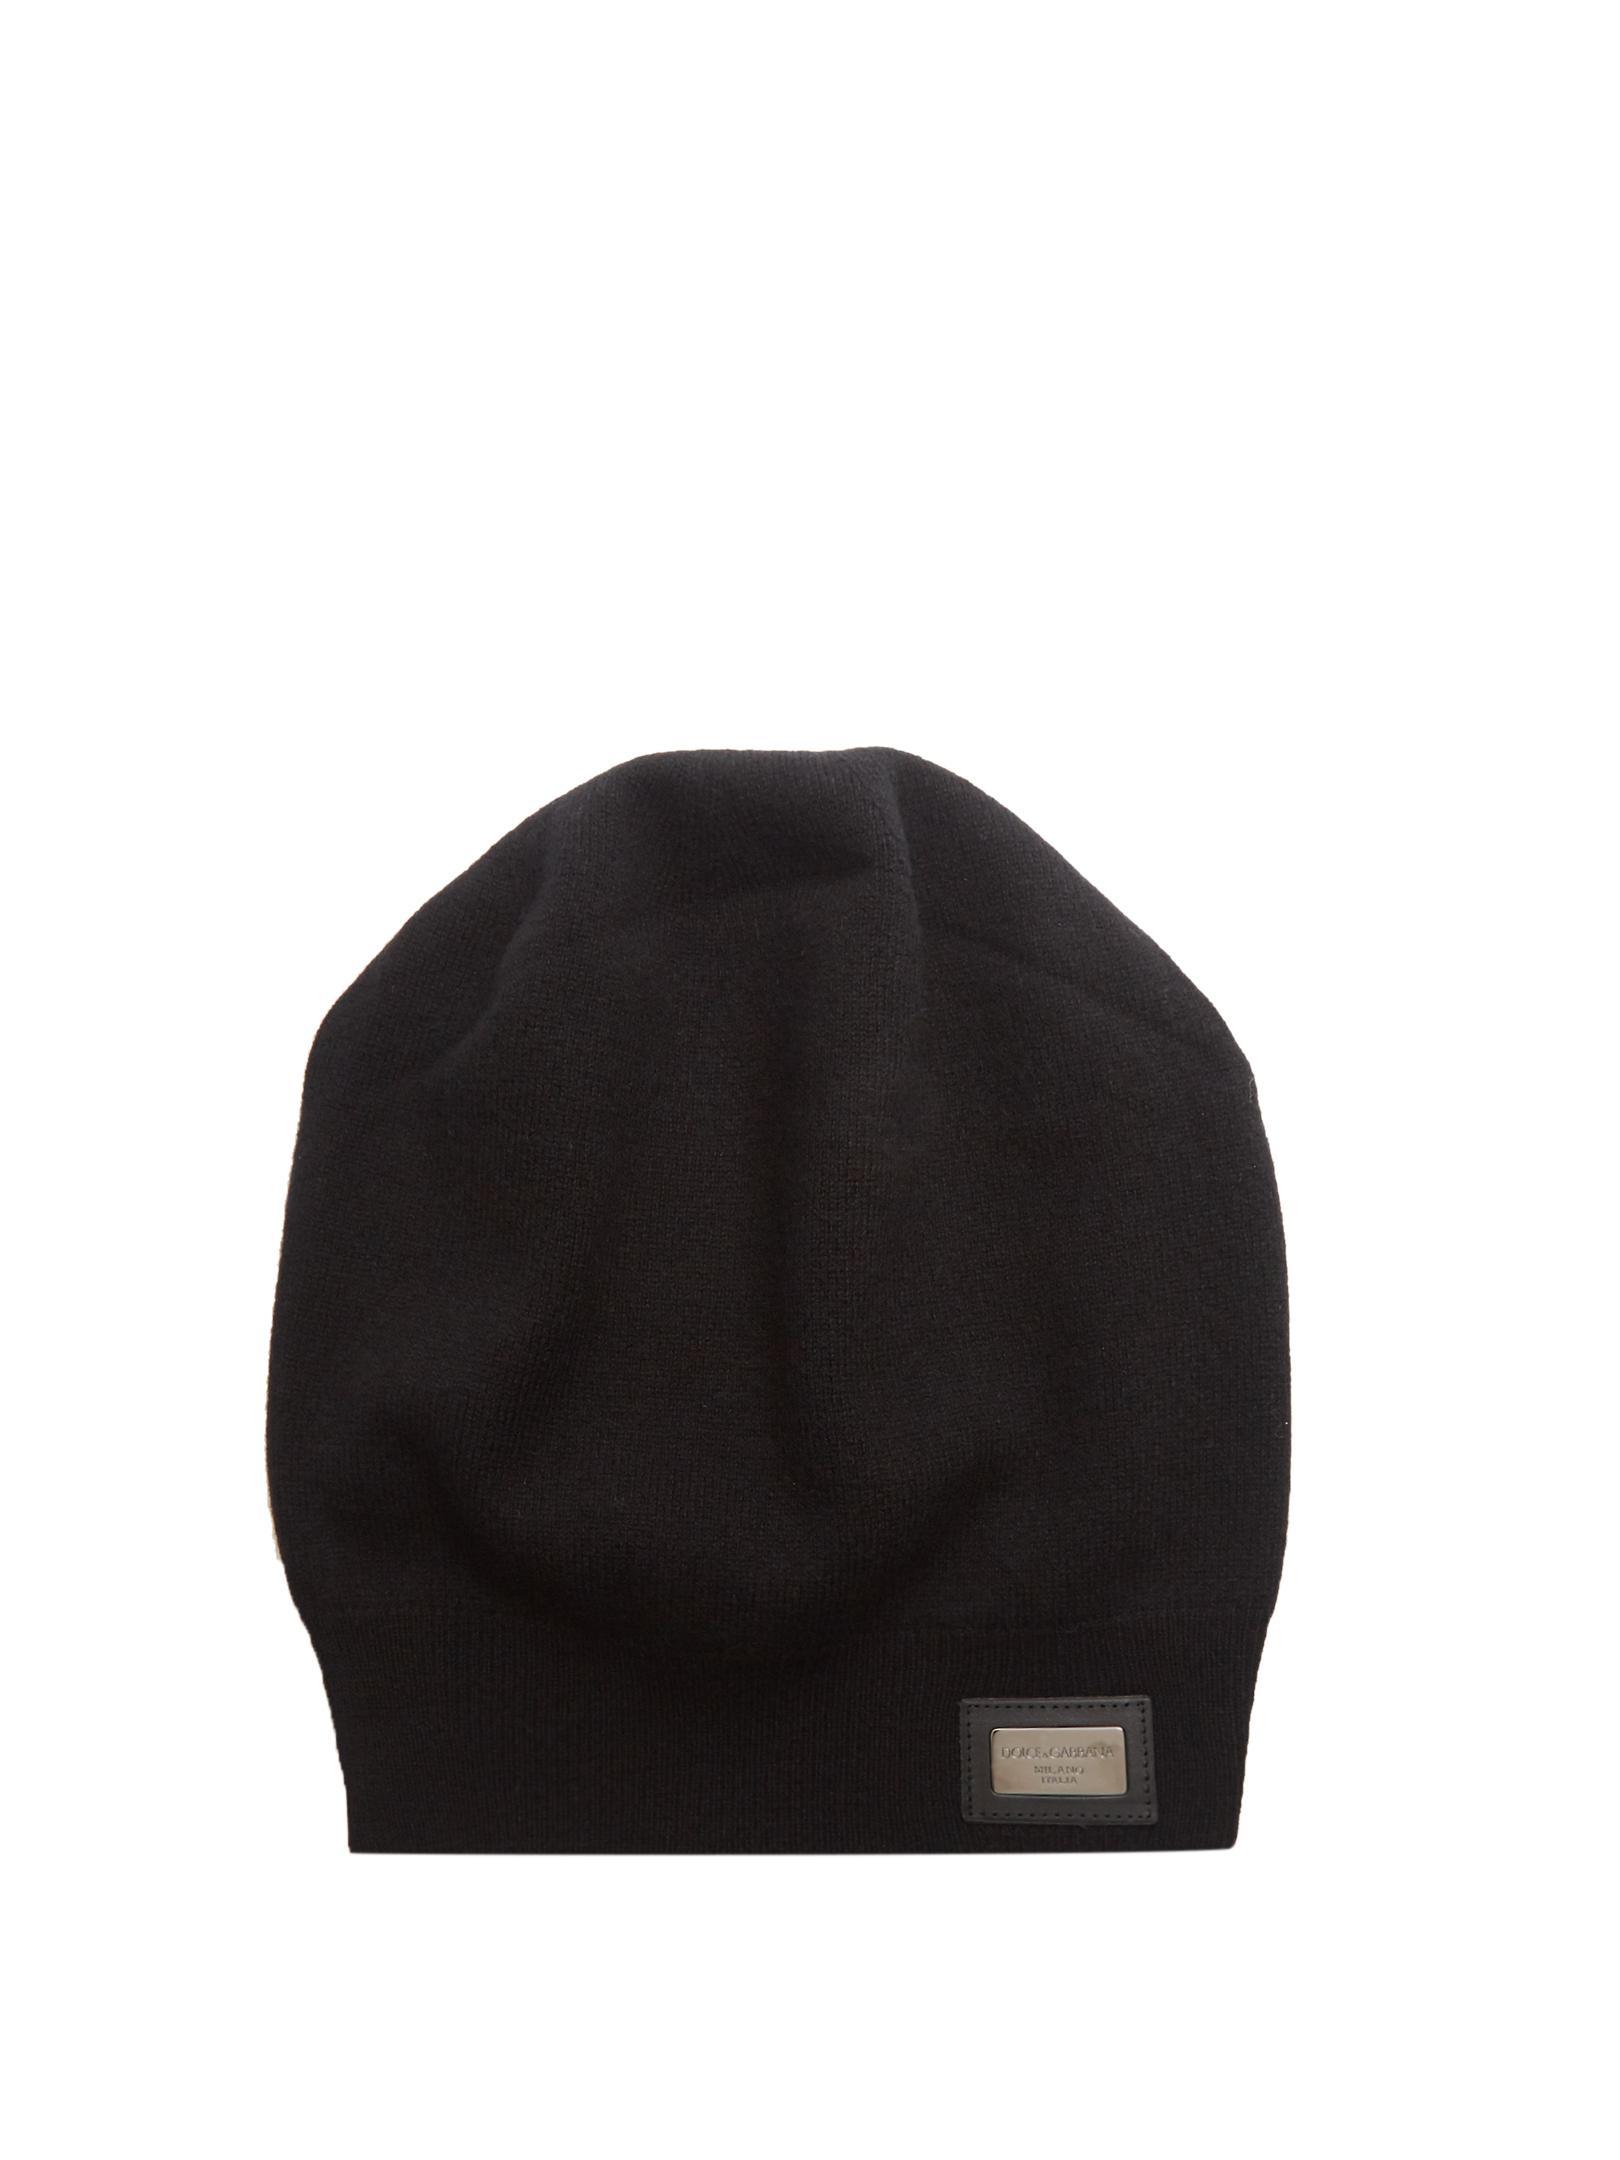 cb14933a54d Dolce   Gabbana Logo-patch Cashmere Beanie Hat in Black for Men - Lyst